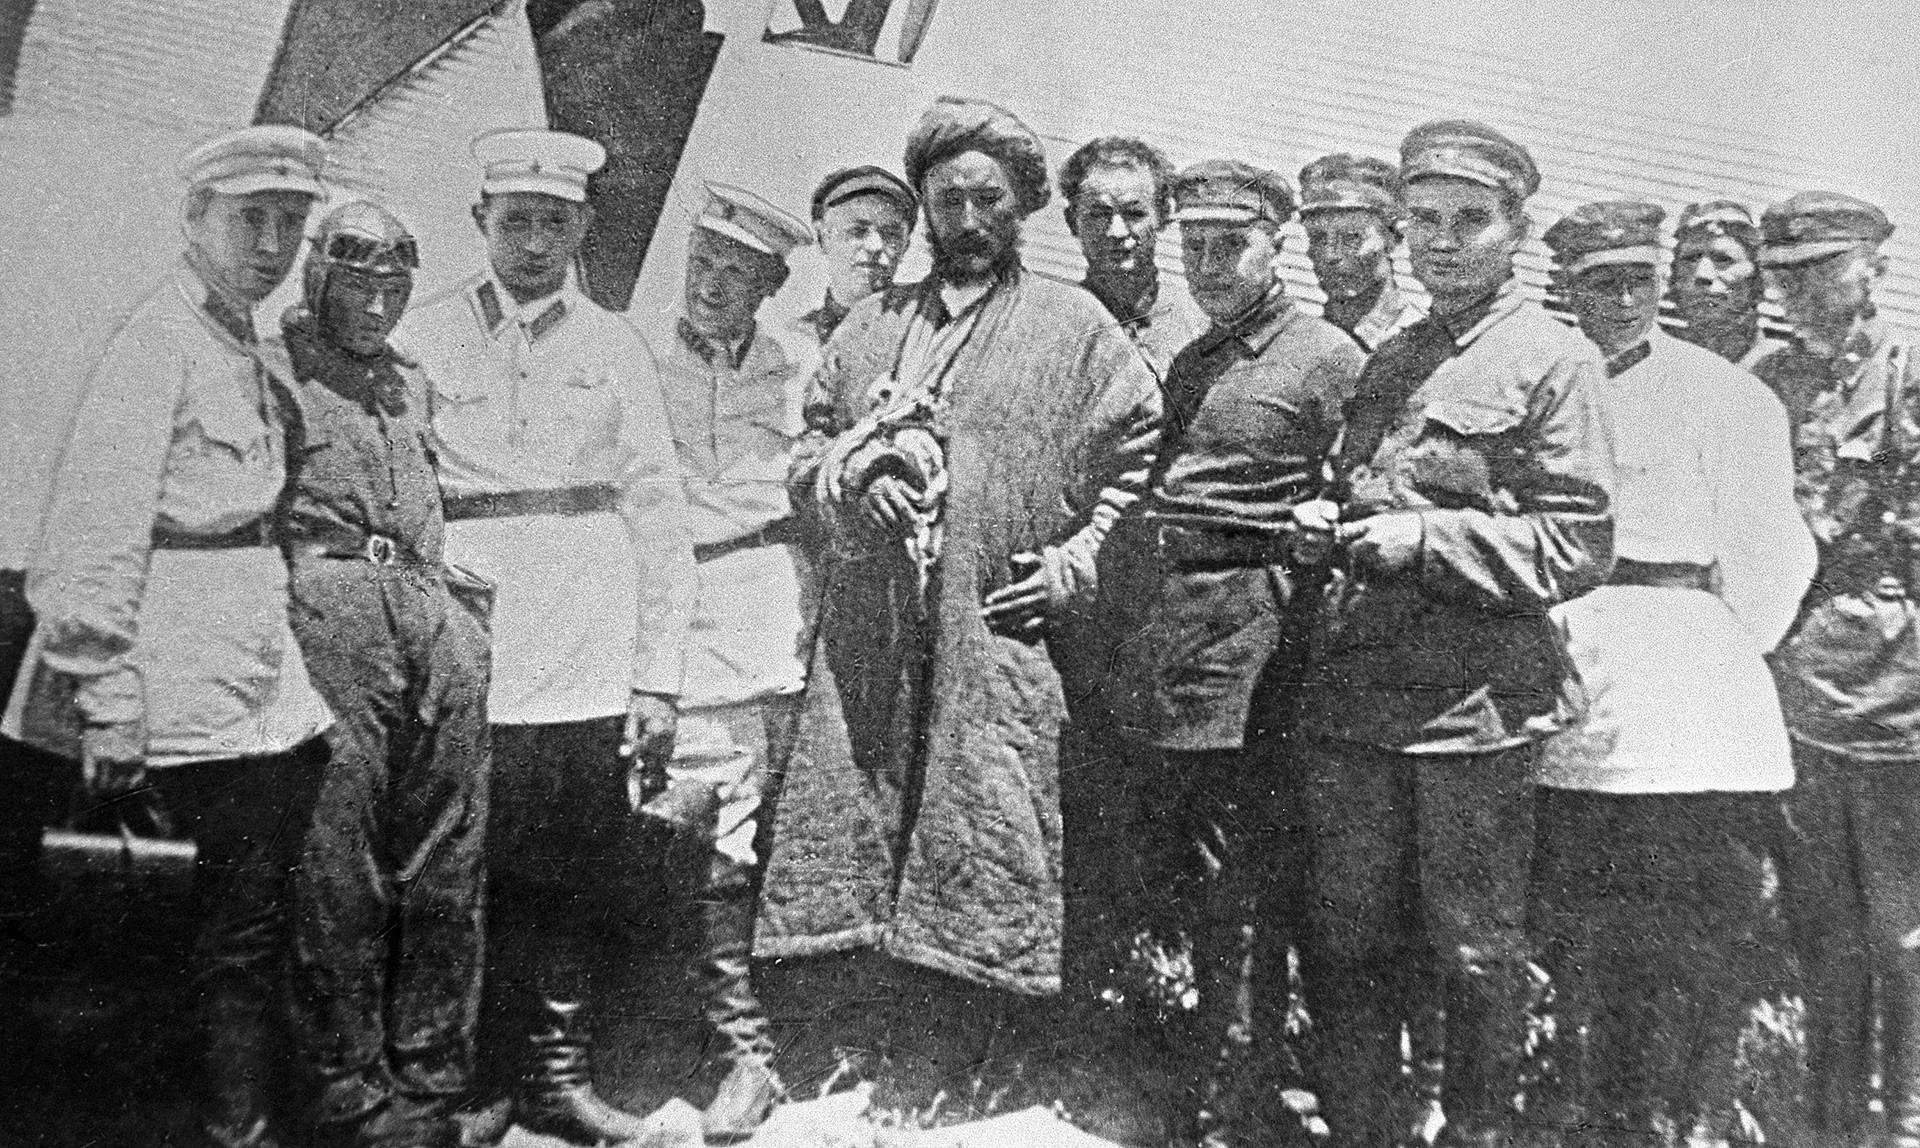 A group of the OGPU officers with captured Ibrahim Bek (center), leader of the Basmachi rebels.